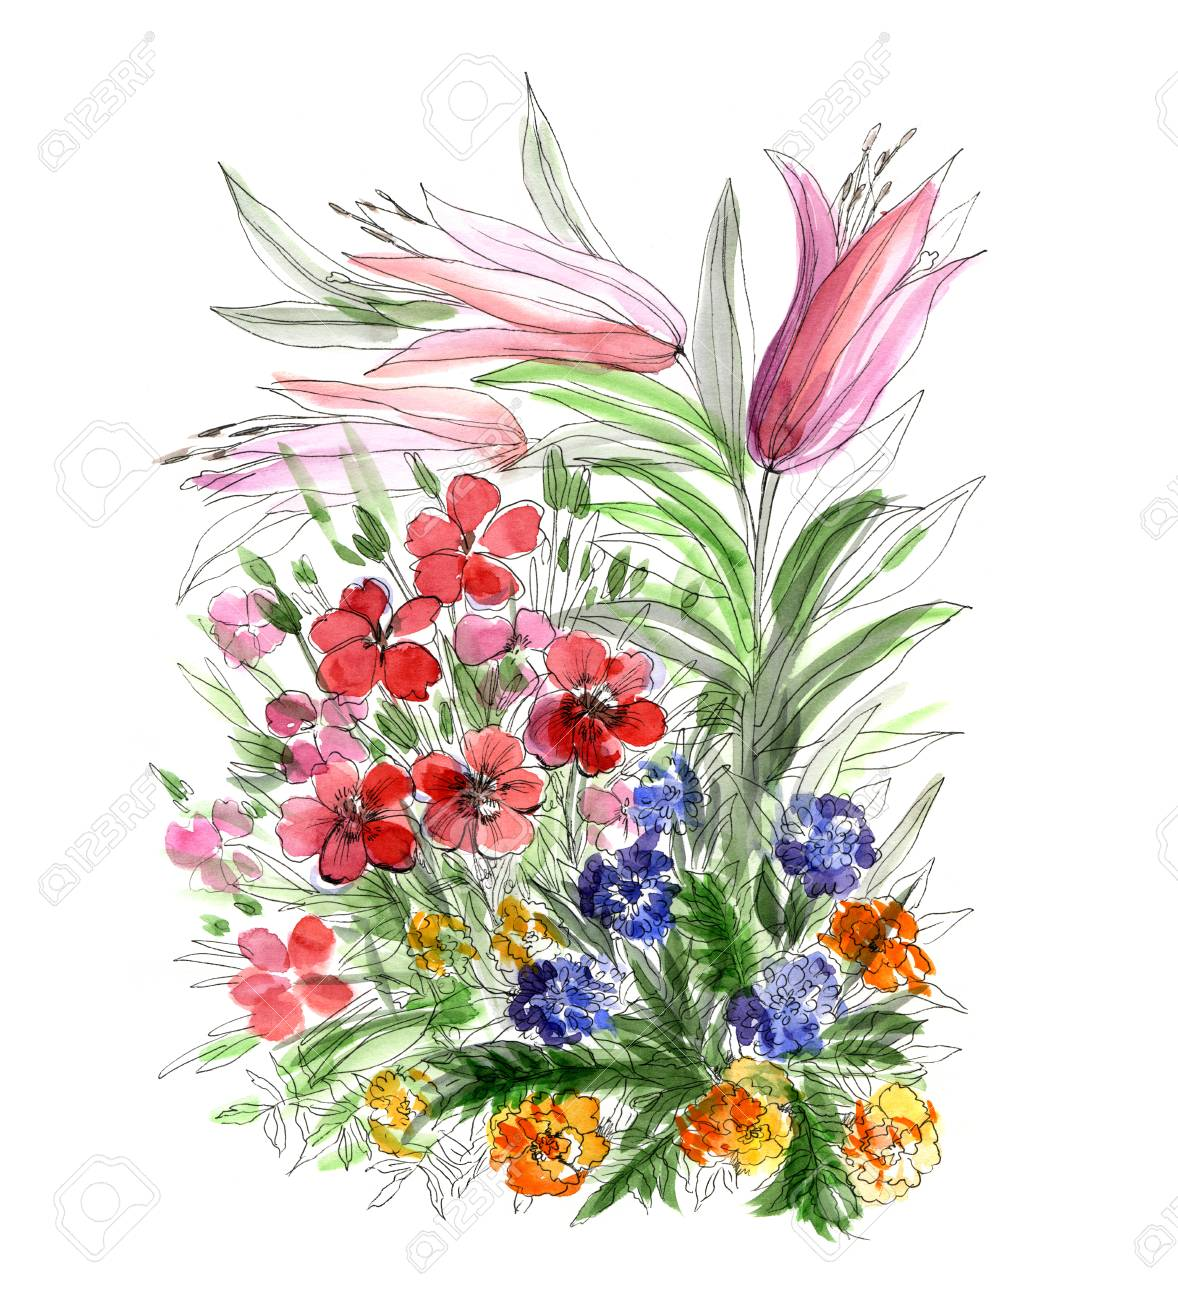 60141446-d%C3%A9coratif-aquarelle-main-dessin-bouquet-de-fleurs.jpg